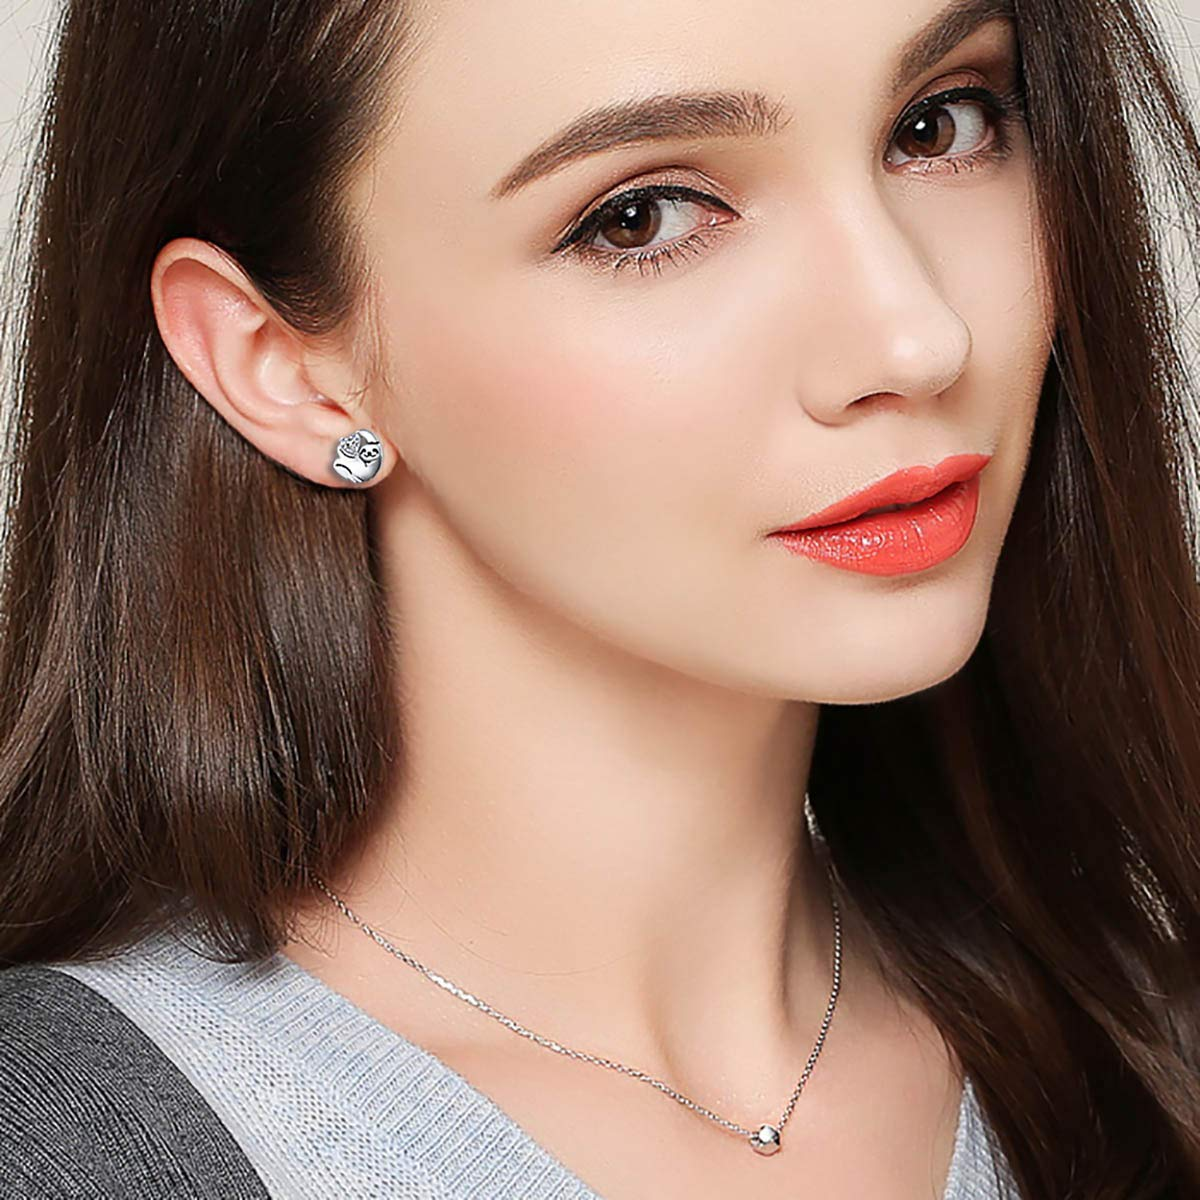 925 Sterling Silver Cute Animal Sloth Earrings Pendant Necklace for Women Girls LINLIN FINE JEWELRY